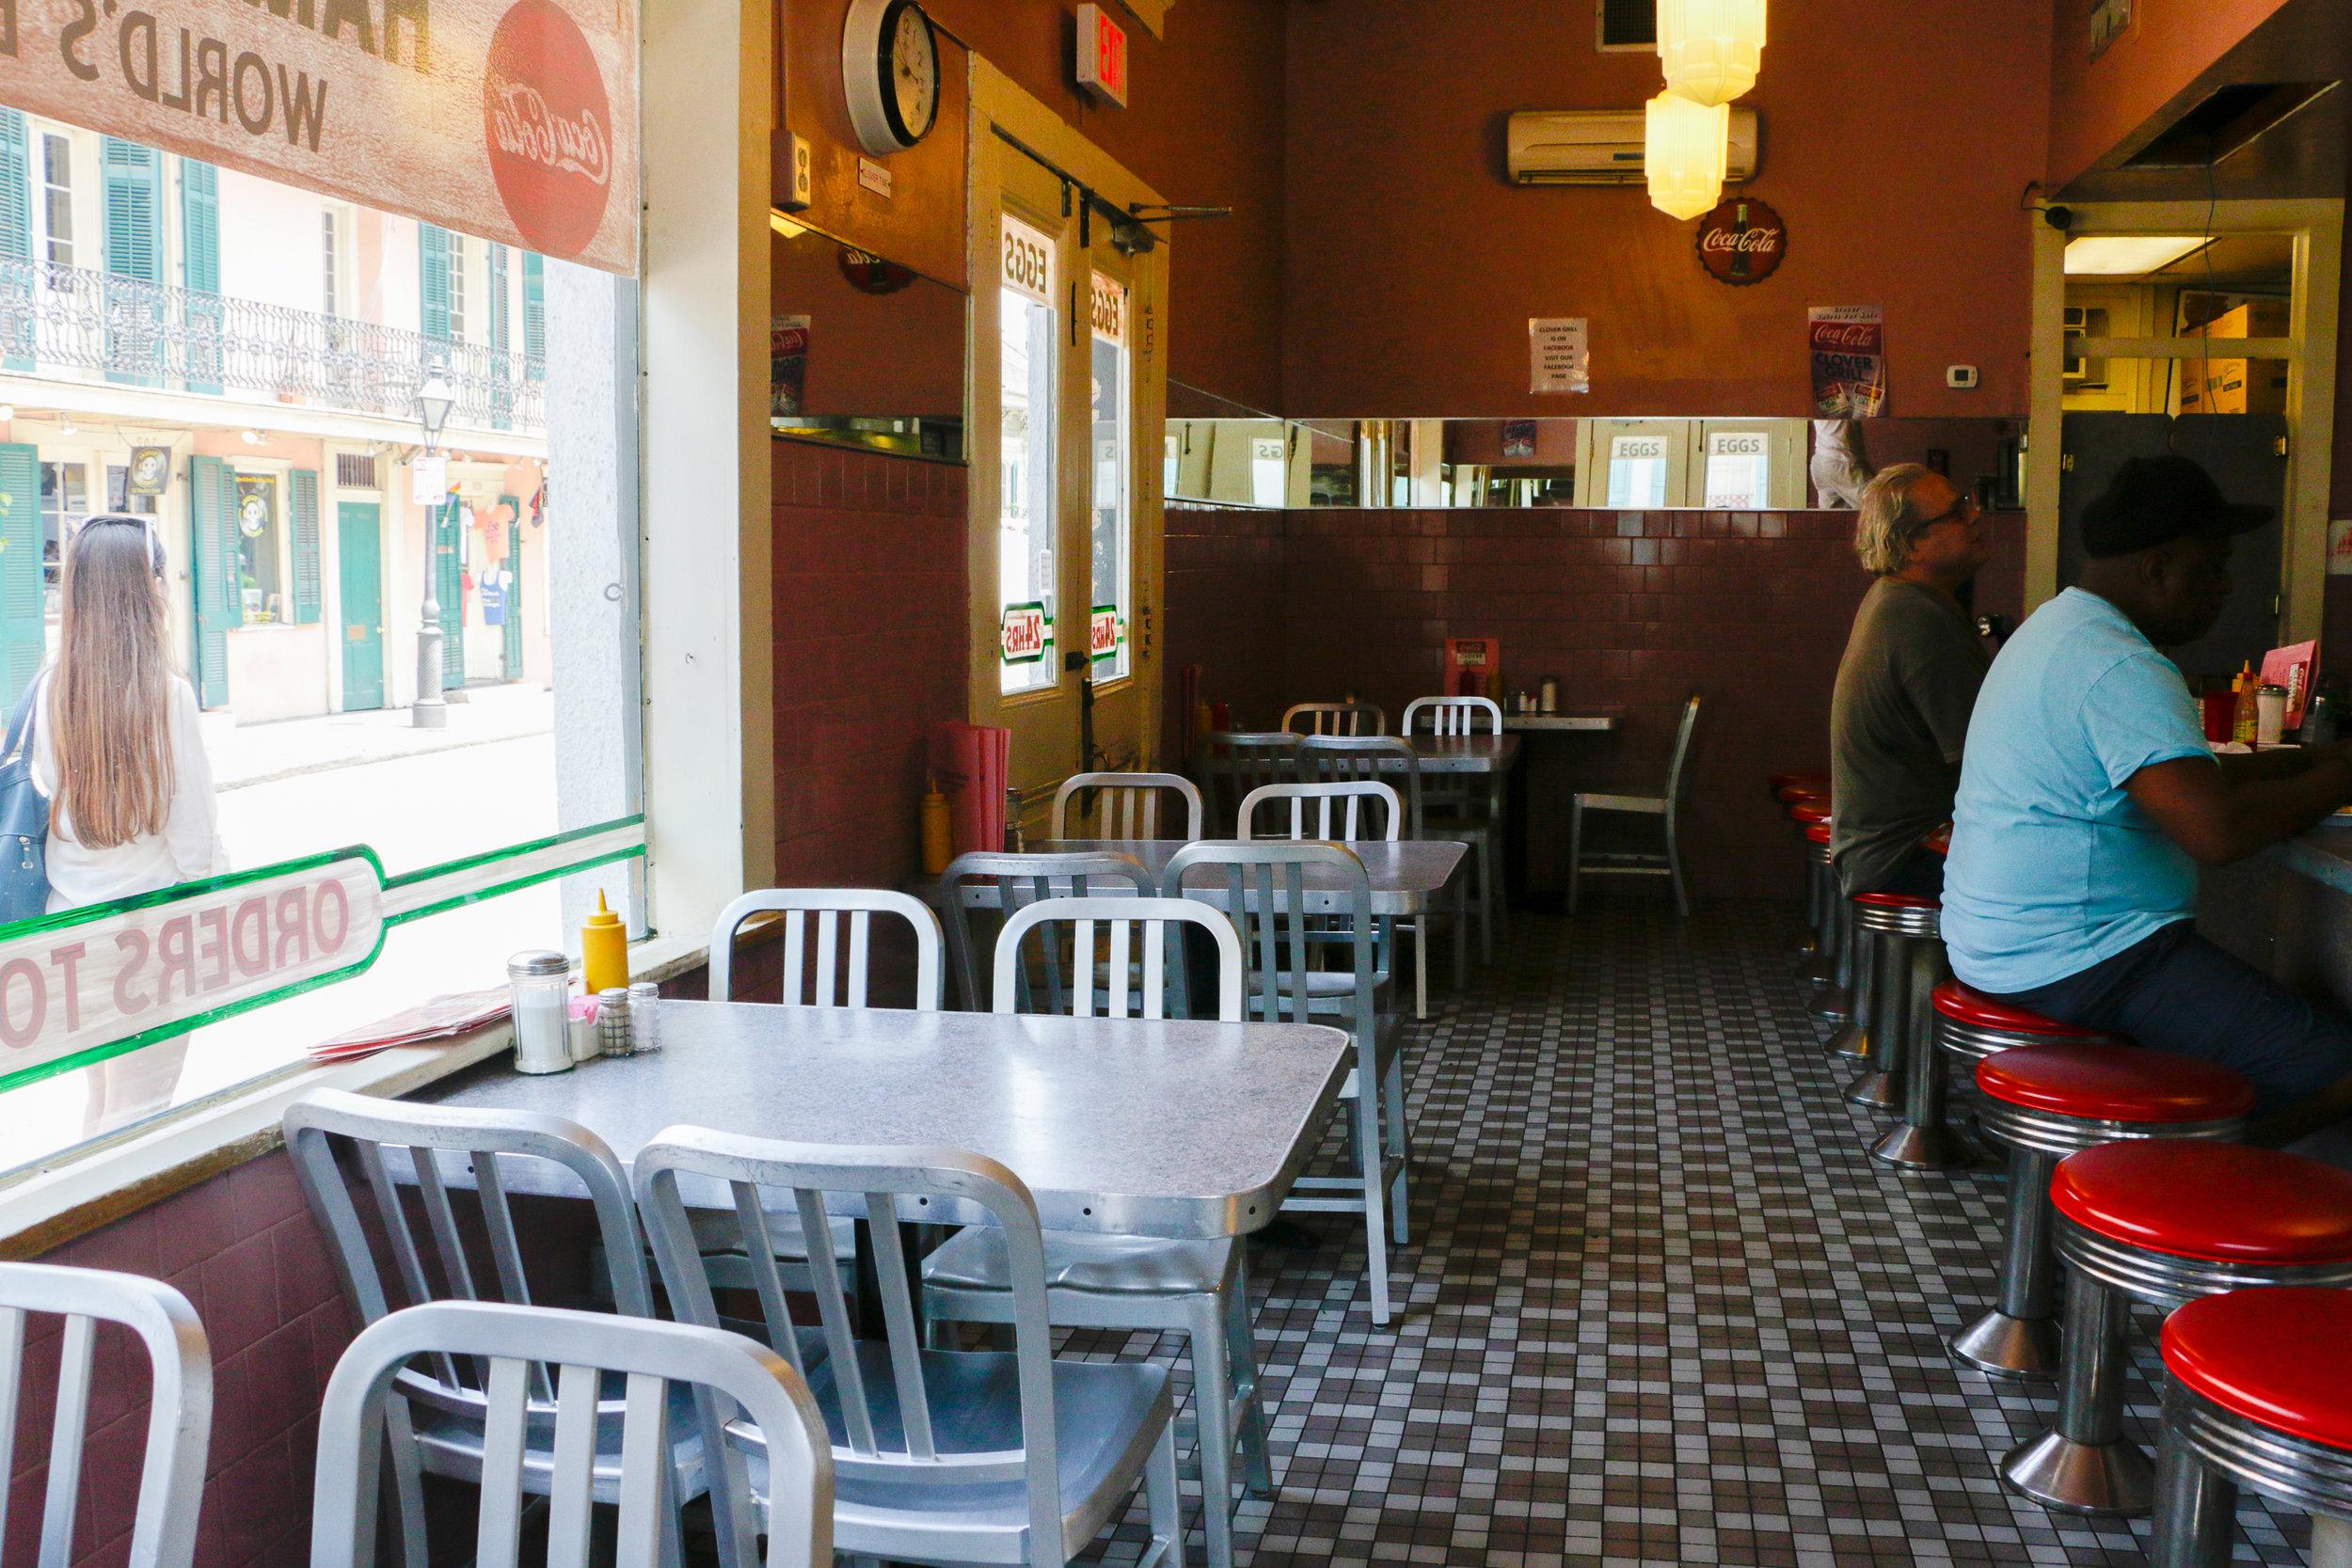 Clover Grill, 900 Bourbon St, New Orleans